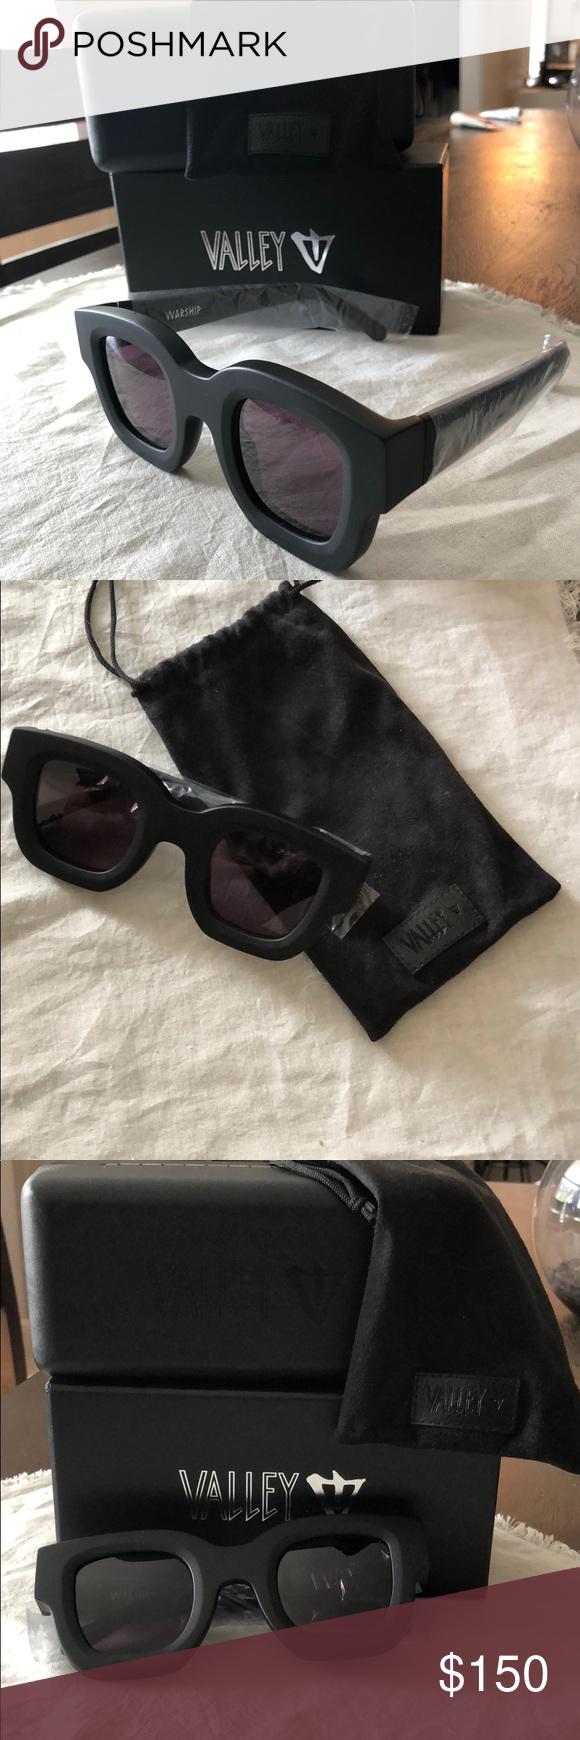 04447277e27 Valley eyewear- warship- black matt Bought less than two months ago ...